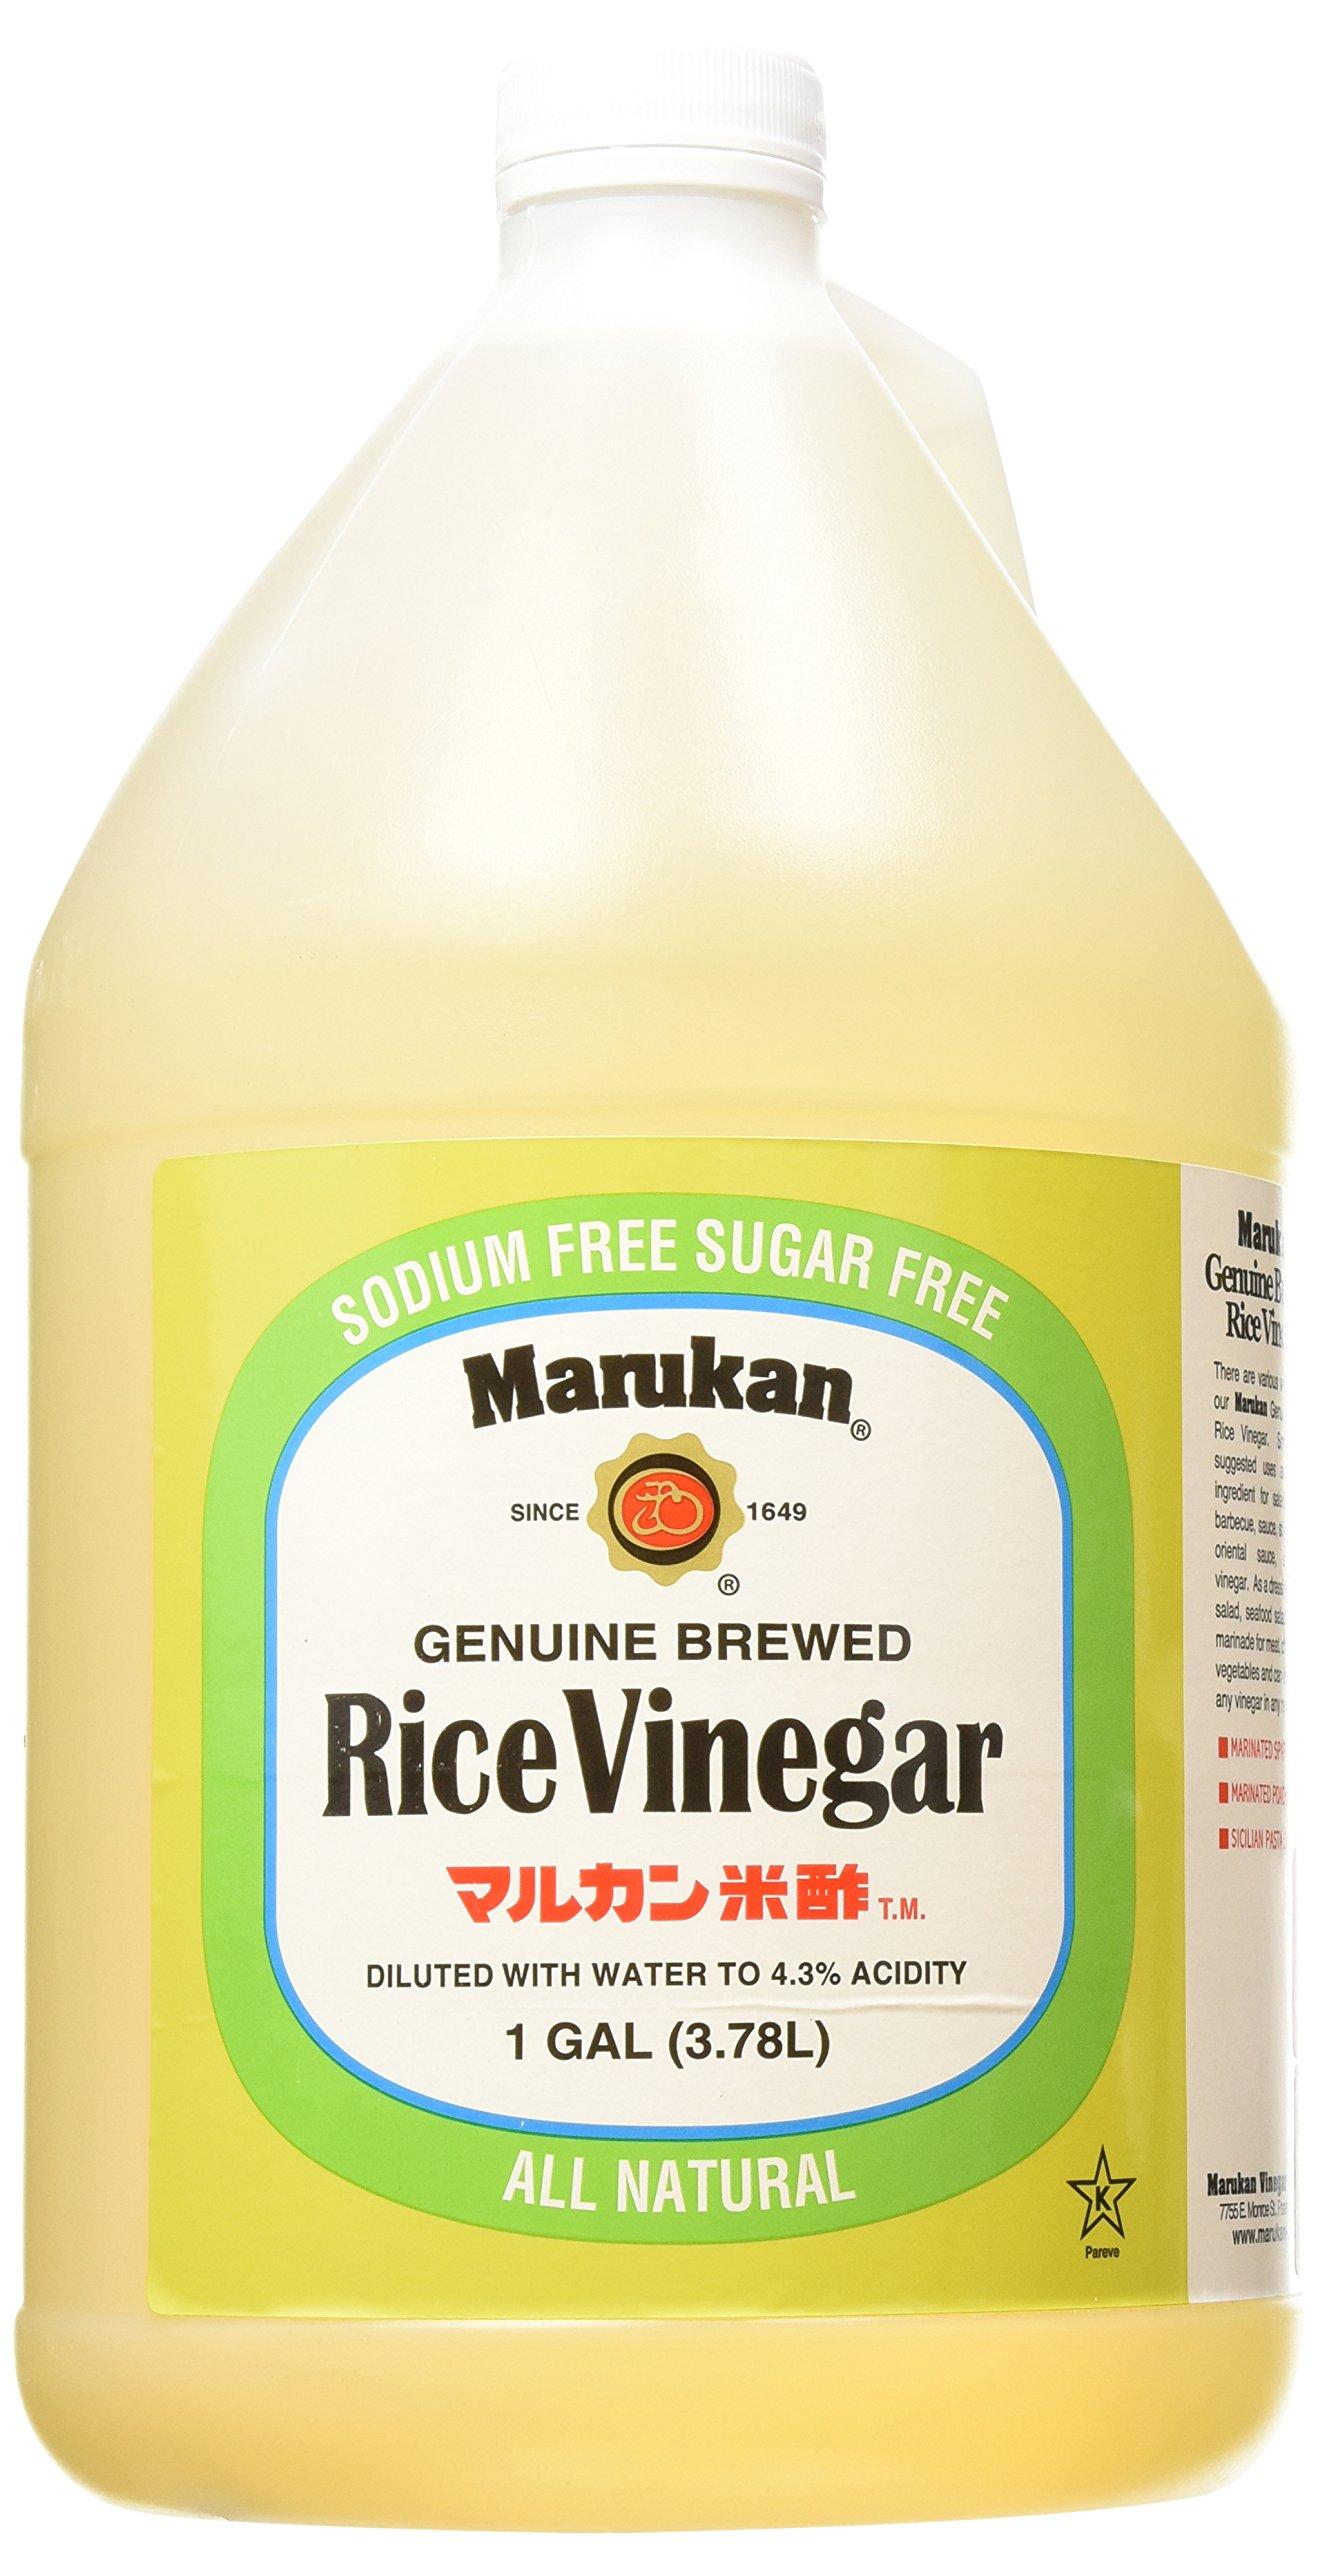 Marukan Genuine Brewed Rice Vinegar Unseasoned, 1 Gallon by Marukan